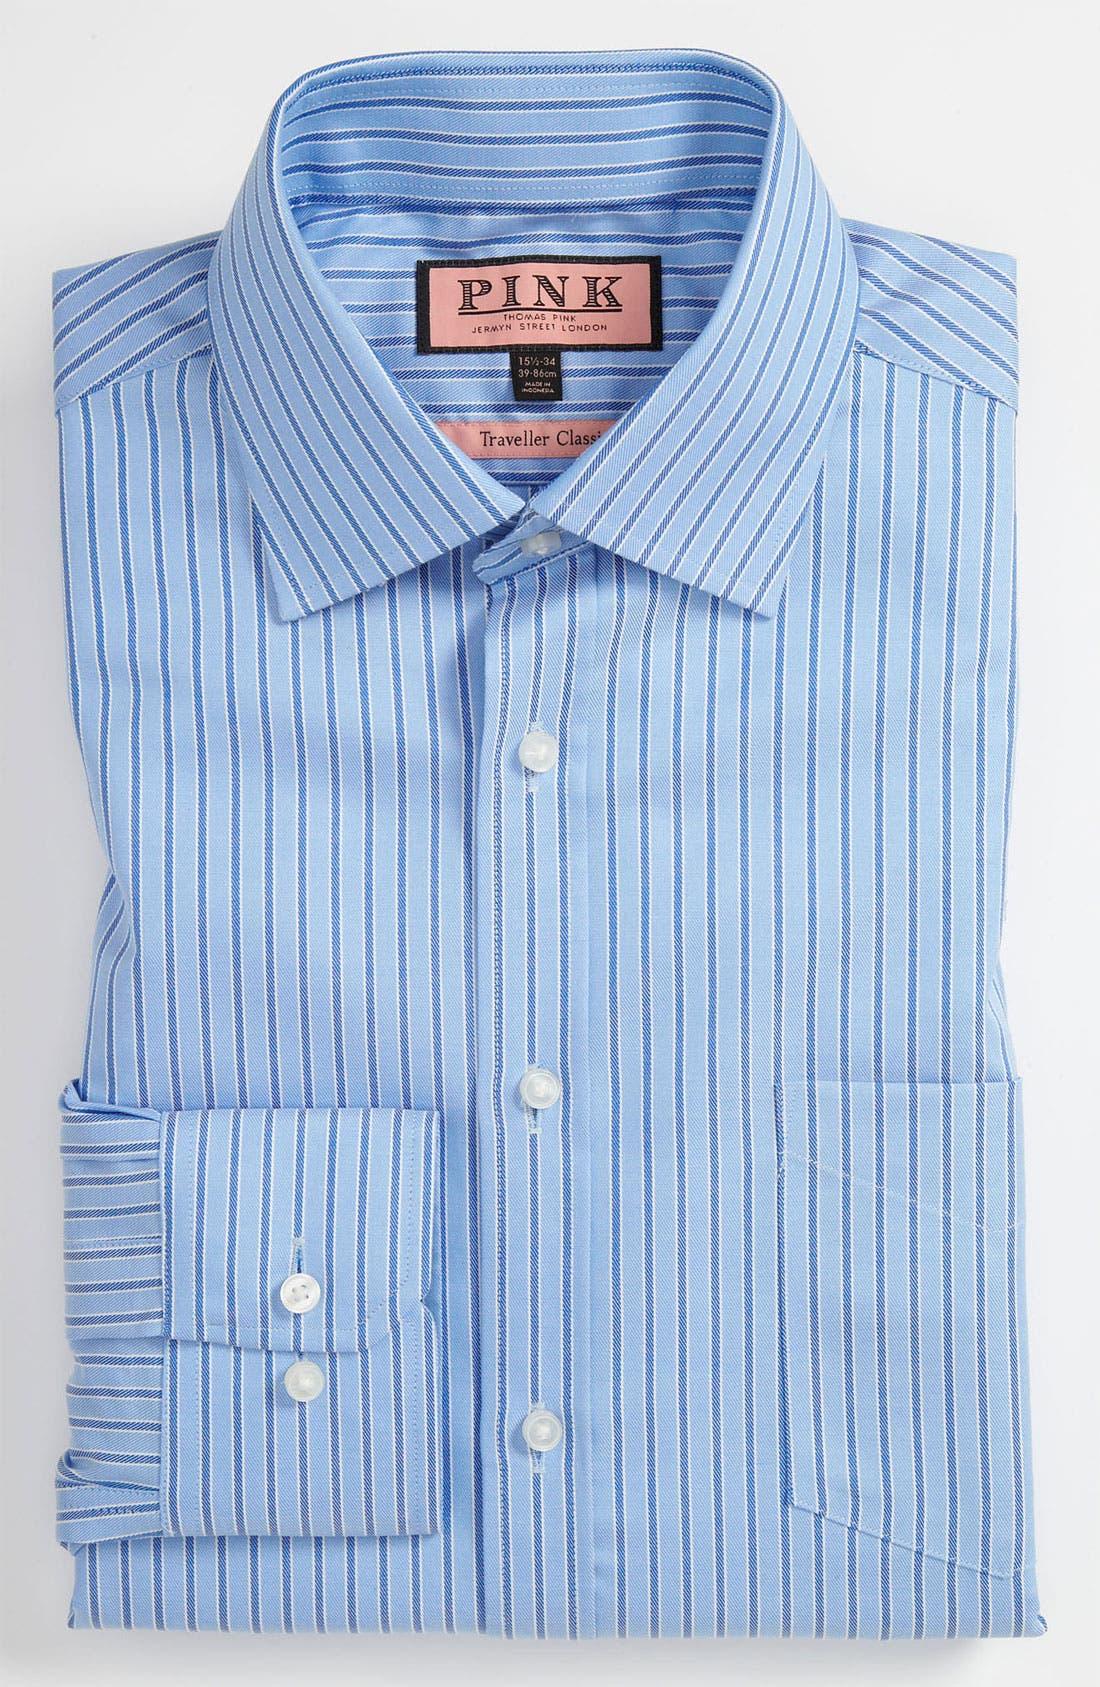 Main Image - Thomas Pink Classic Fit Traveller Dress Shirt